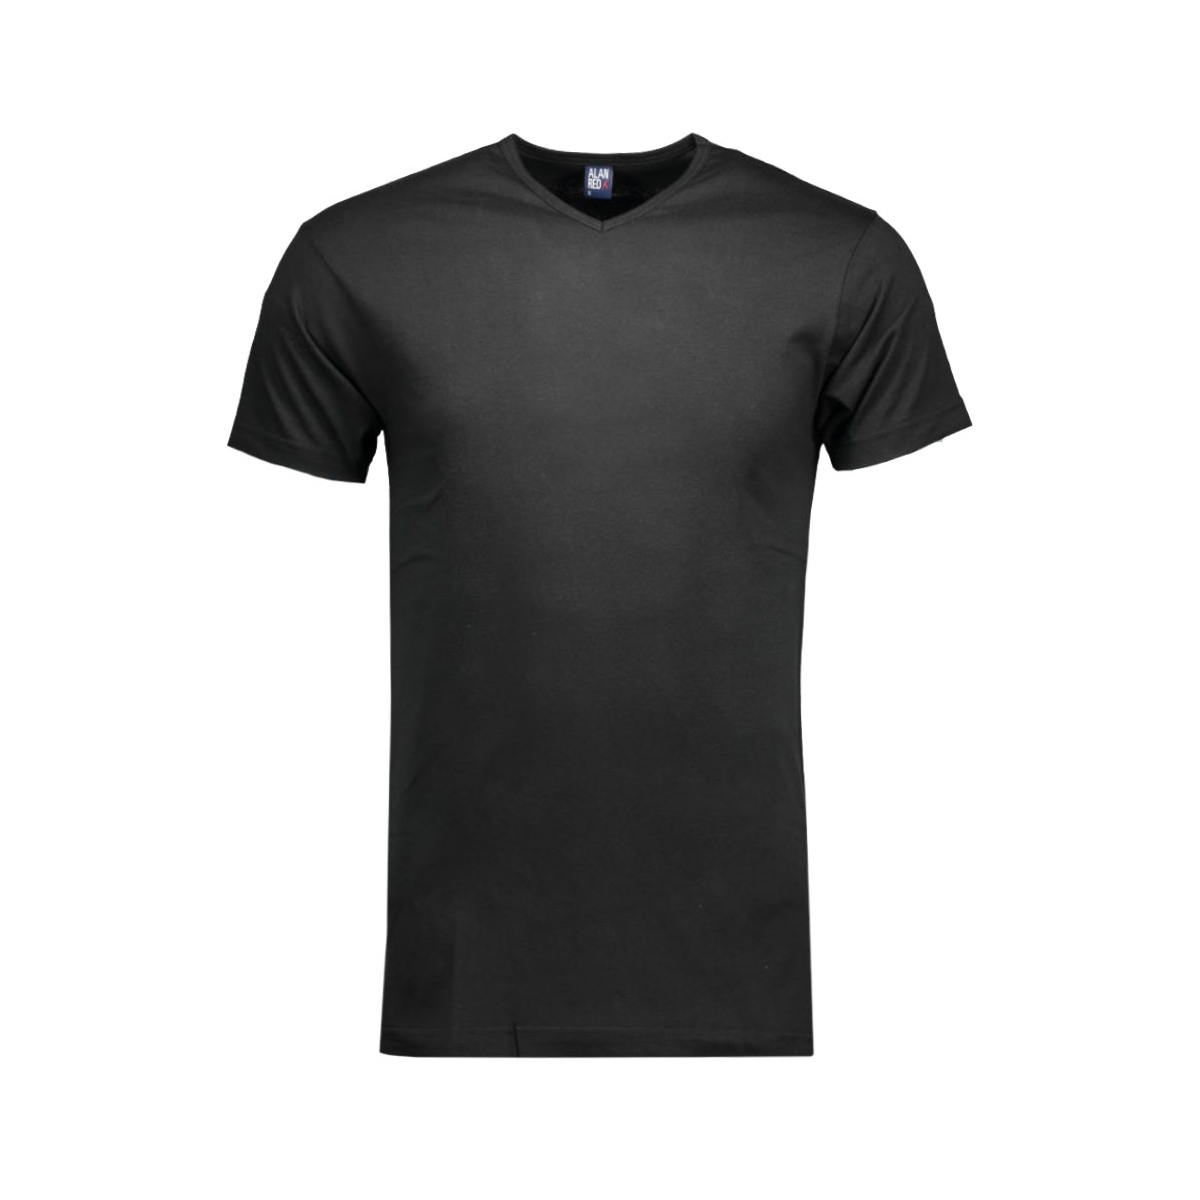 6671sp vermont alan red t-shirt black